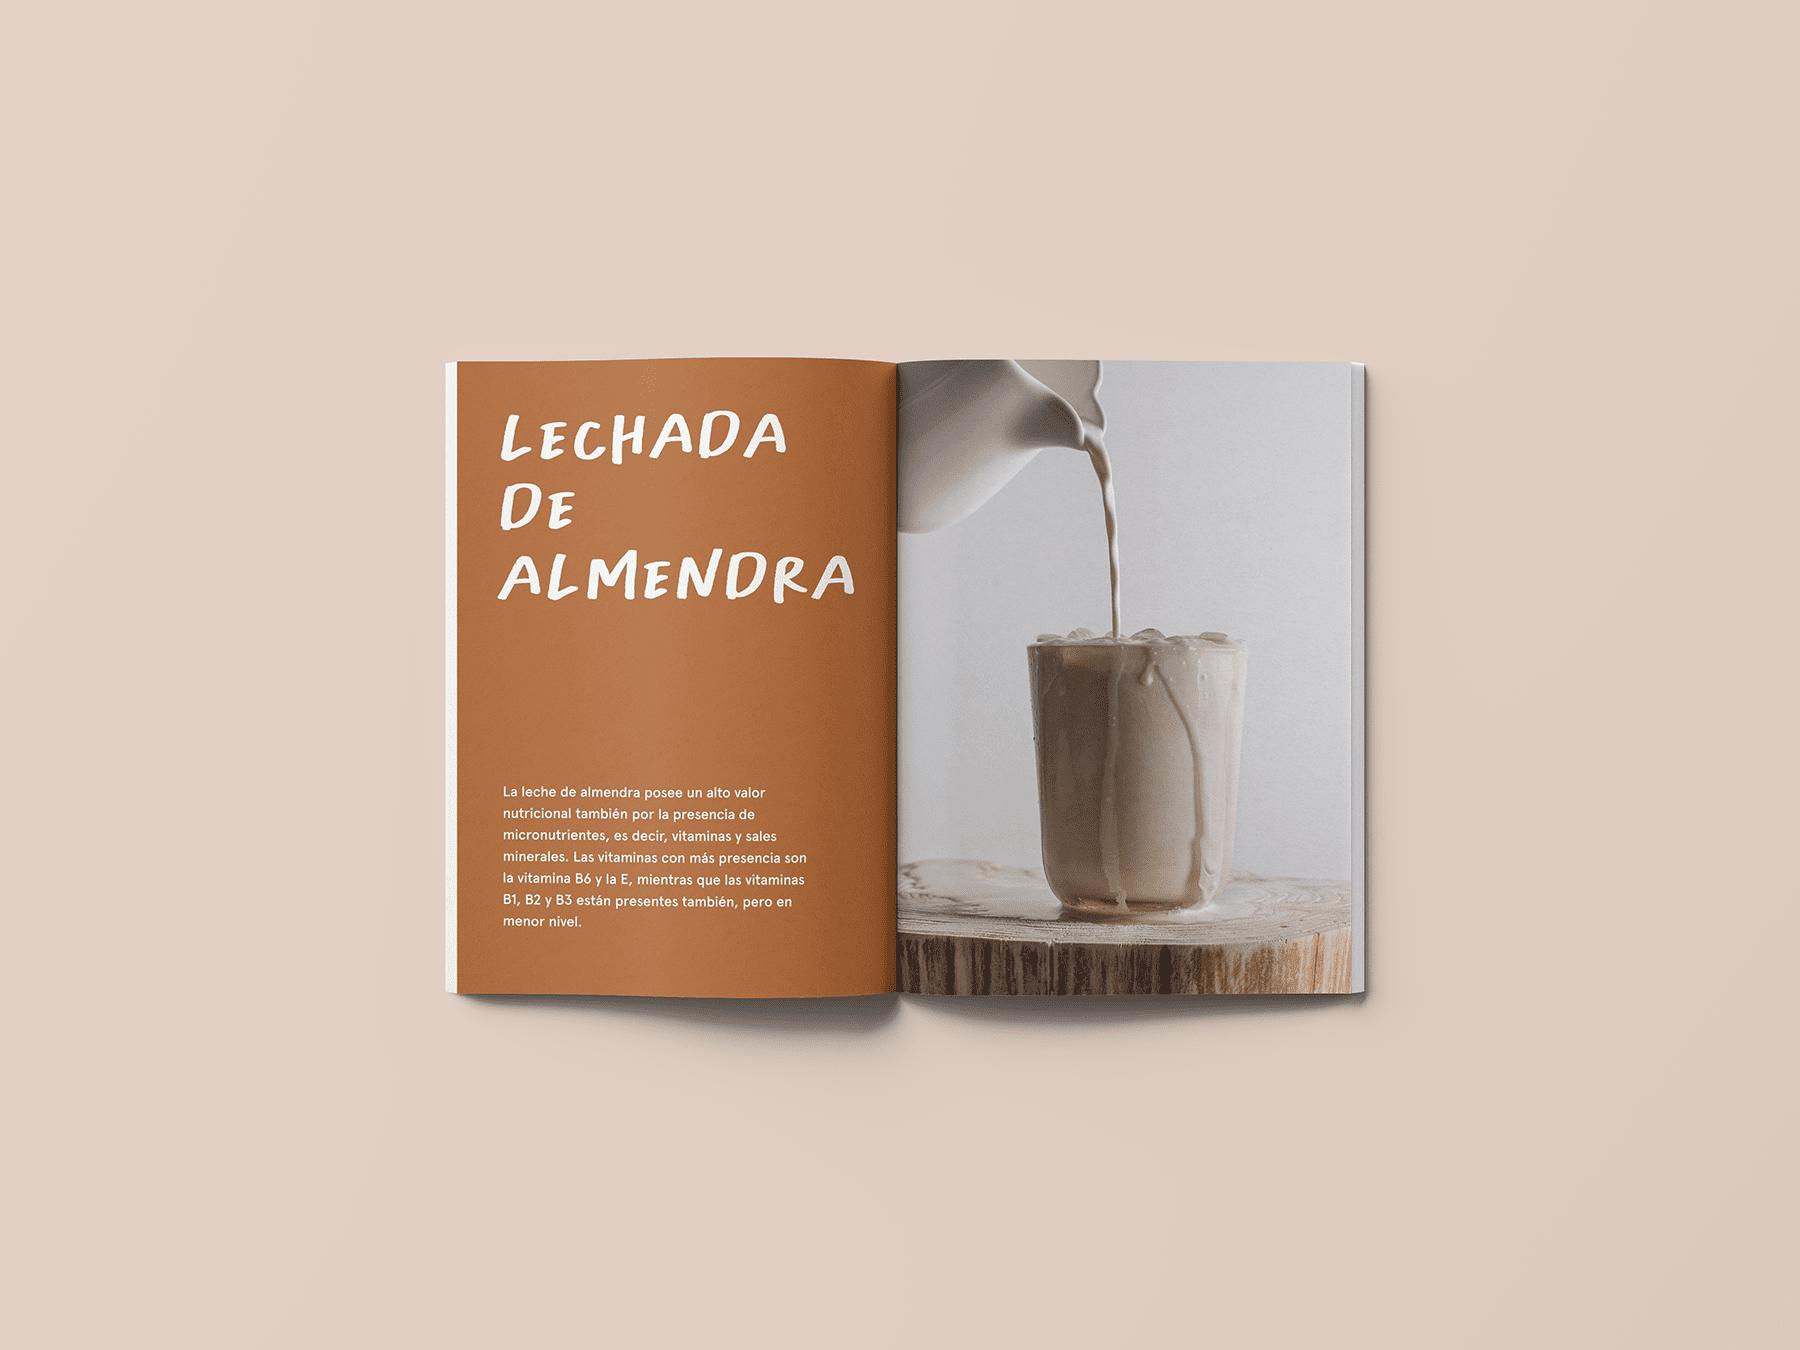 lechada-almendra-yoenpaperland